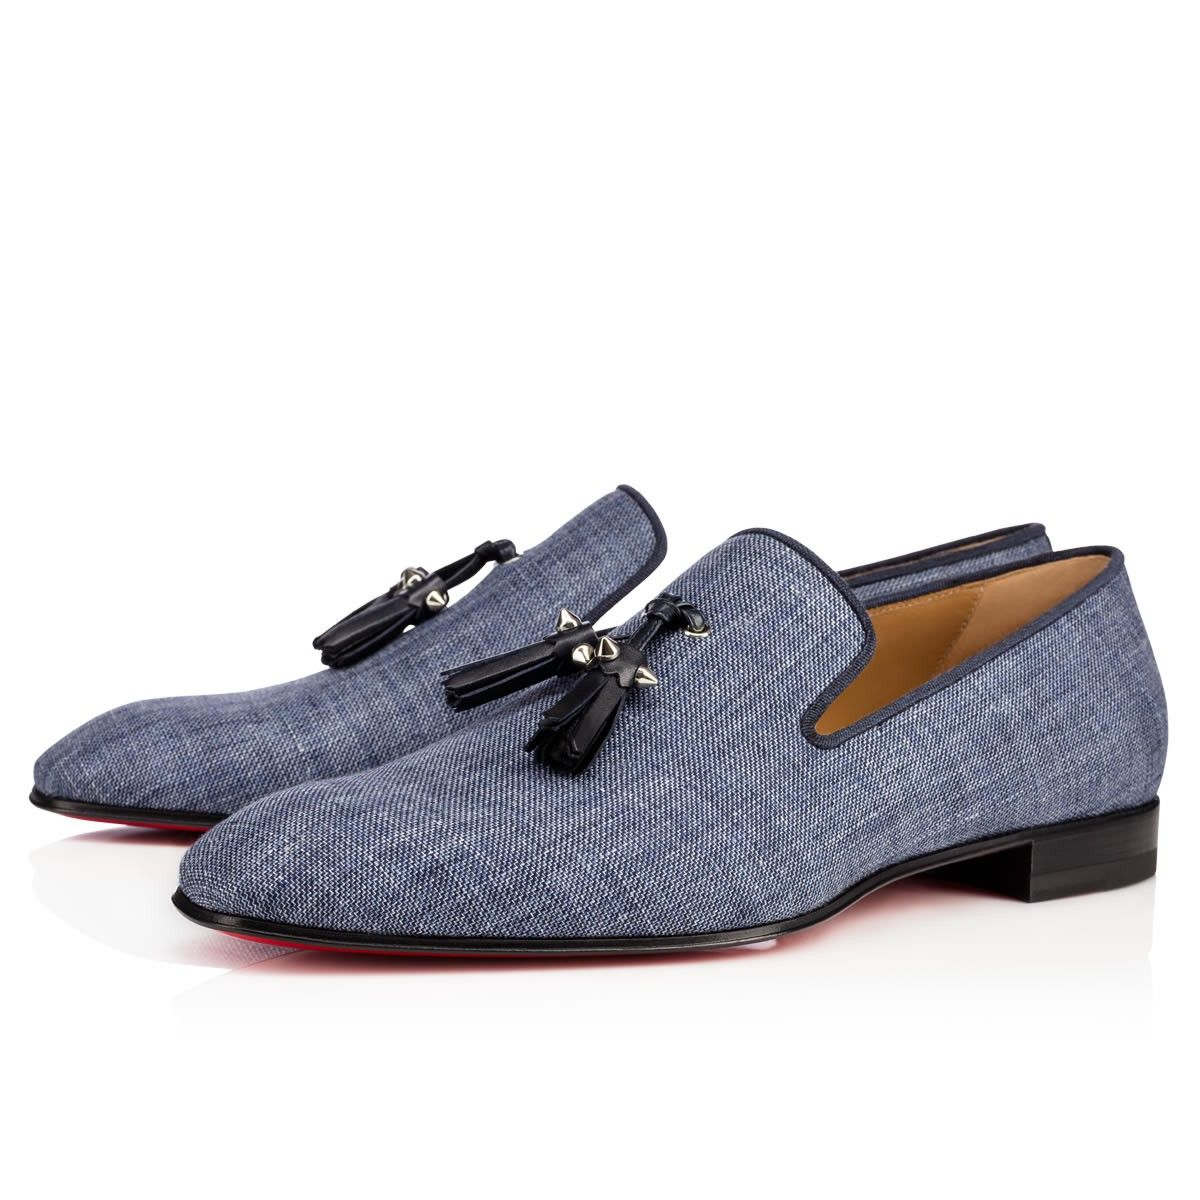 4a0b7021456b Dandelion Tassel Flat Version Navy Denim - Men Shoes - Christian Louboutin